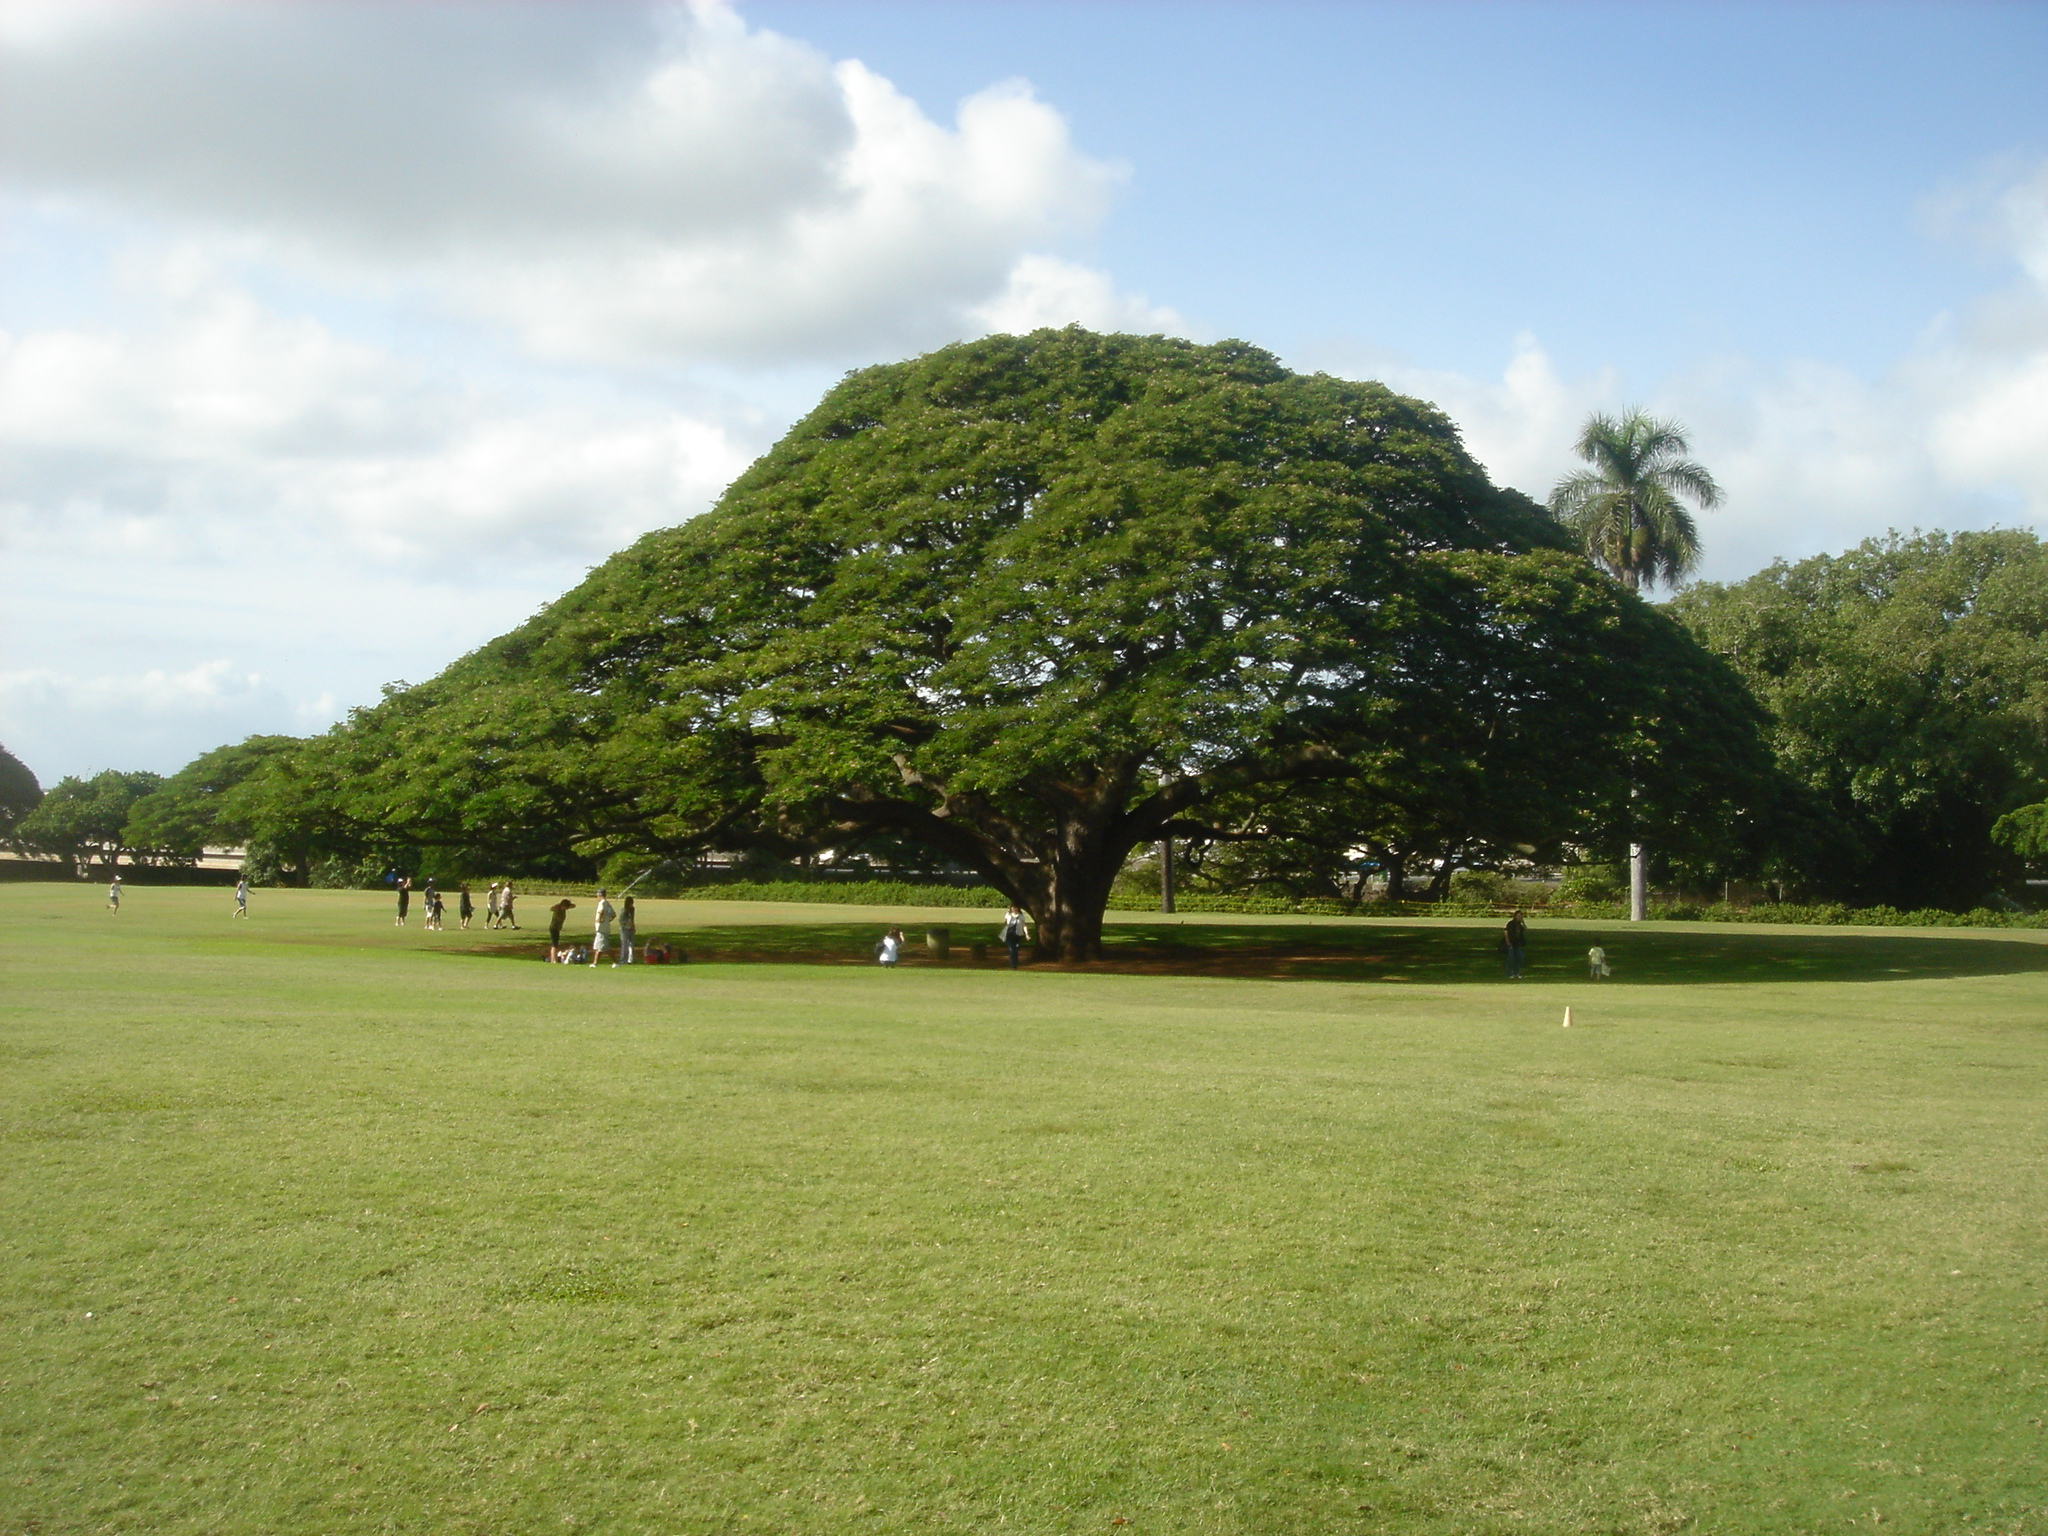 CMでおなじみの日本で最も有名と思われる広葉樹